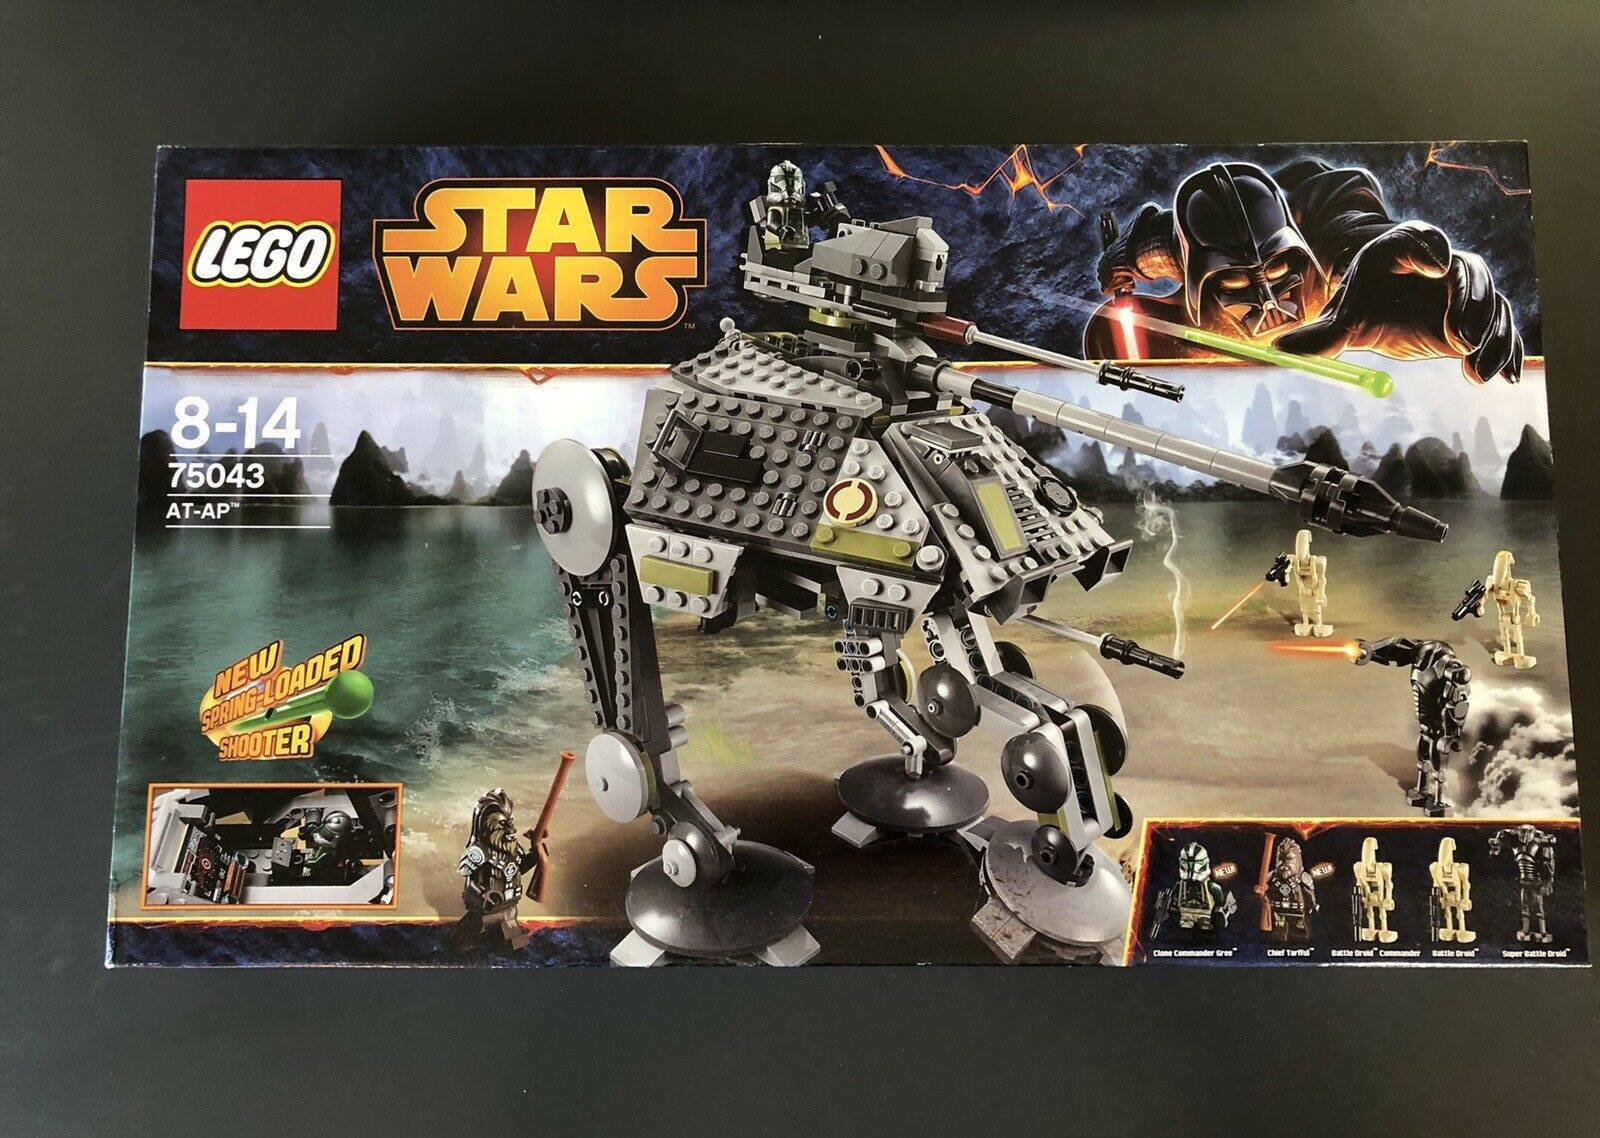 LEGO StarWars AT-AP (LEGO 75043) - ungeöffnet - neu neu neu ac2f75